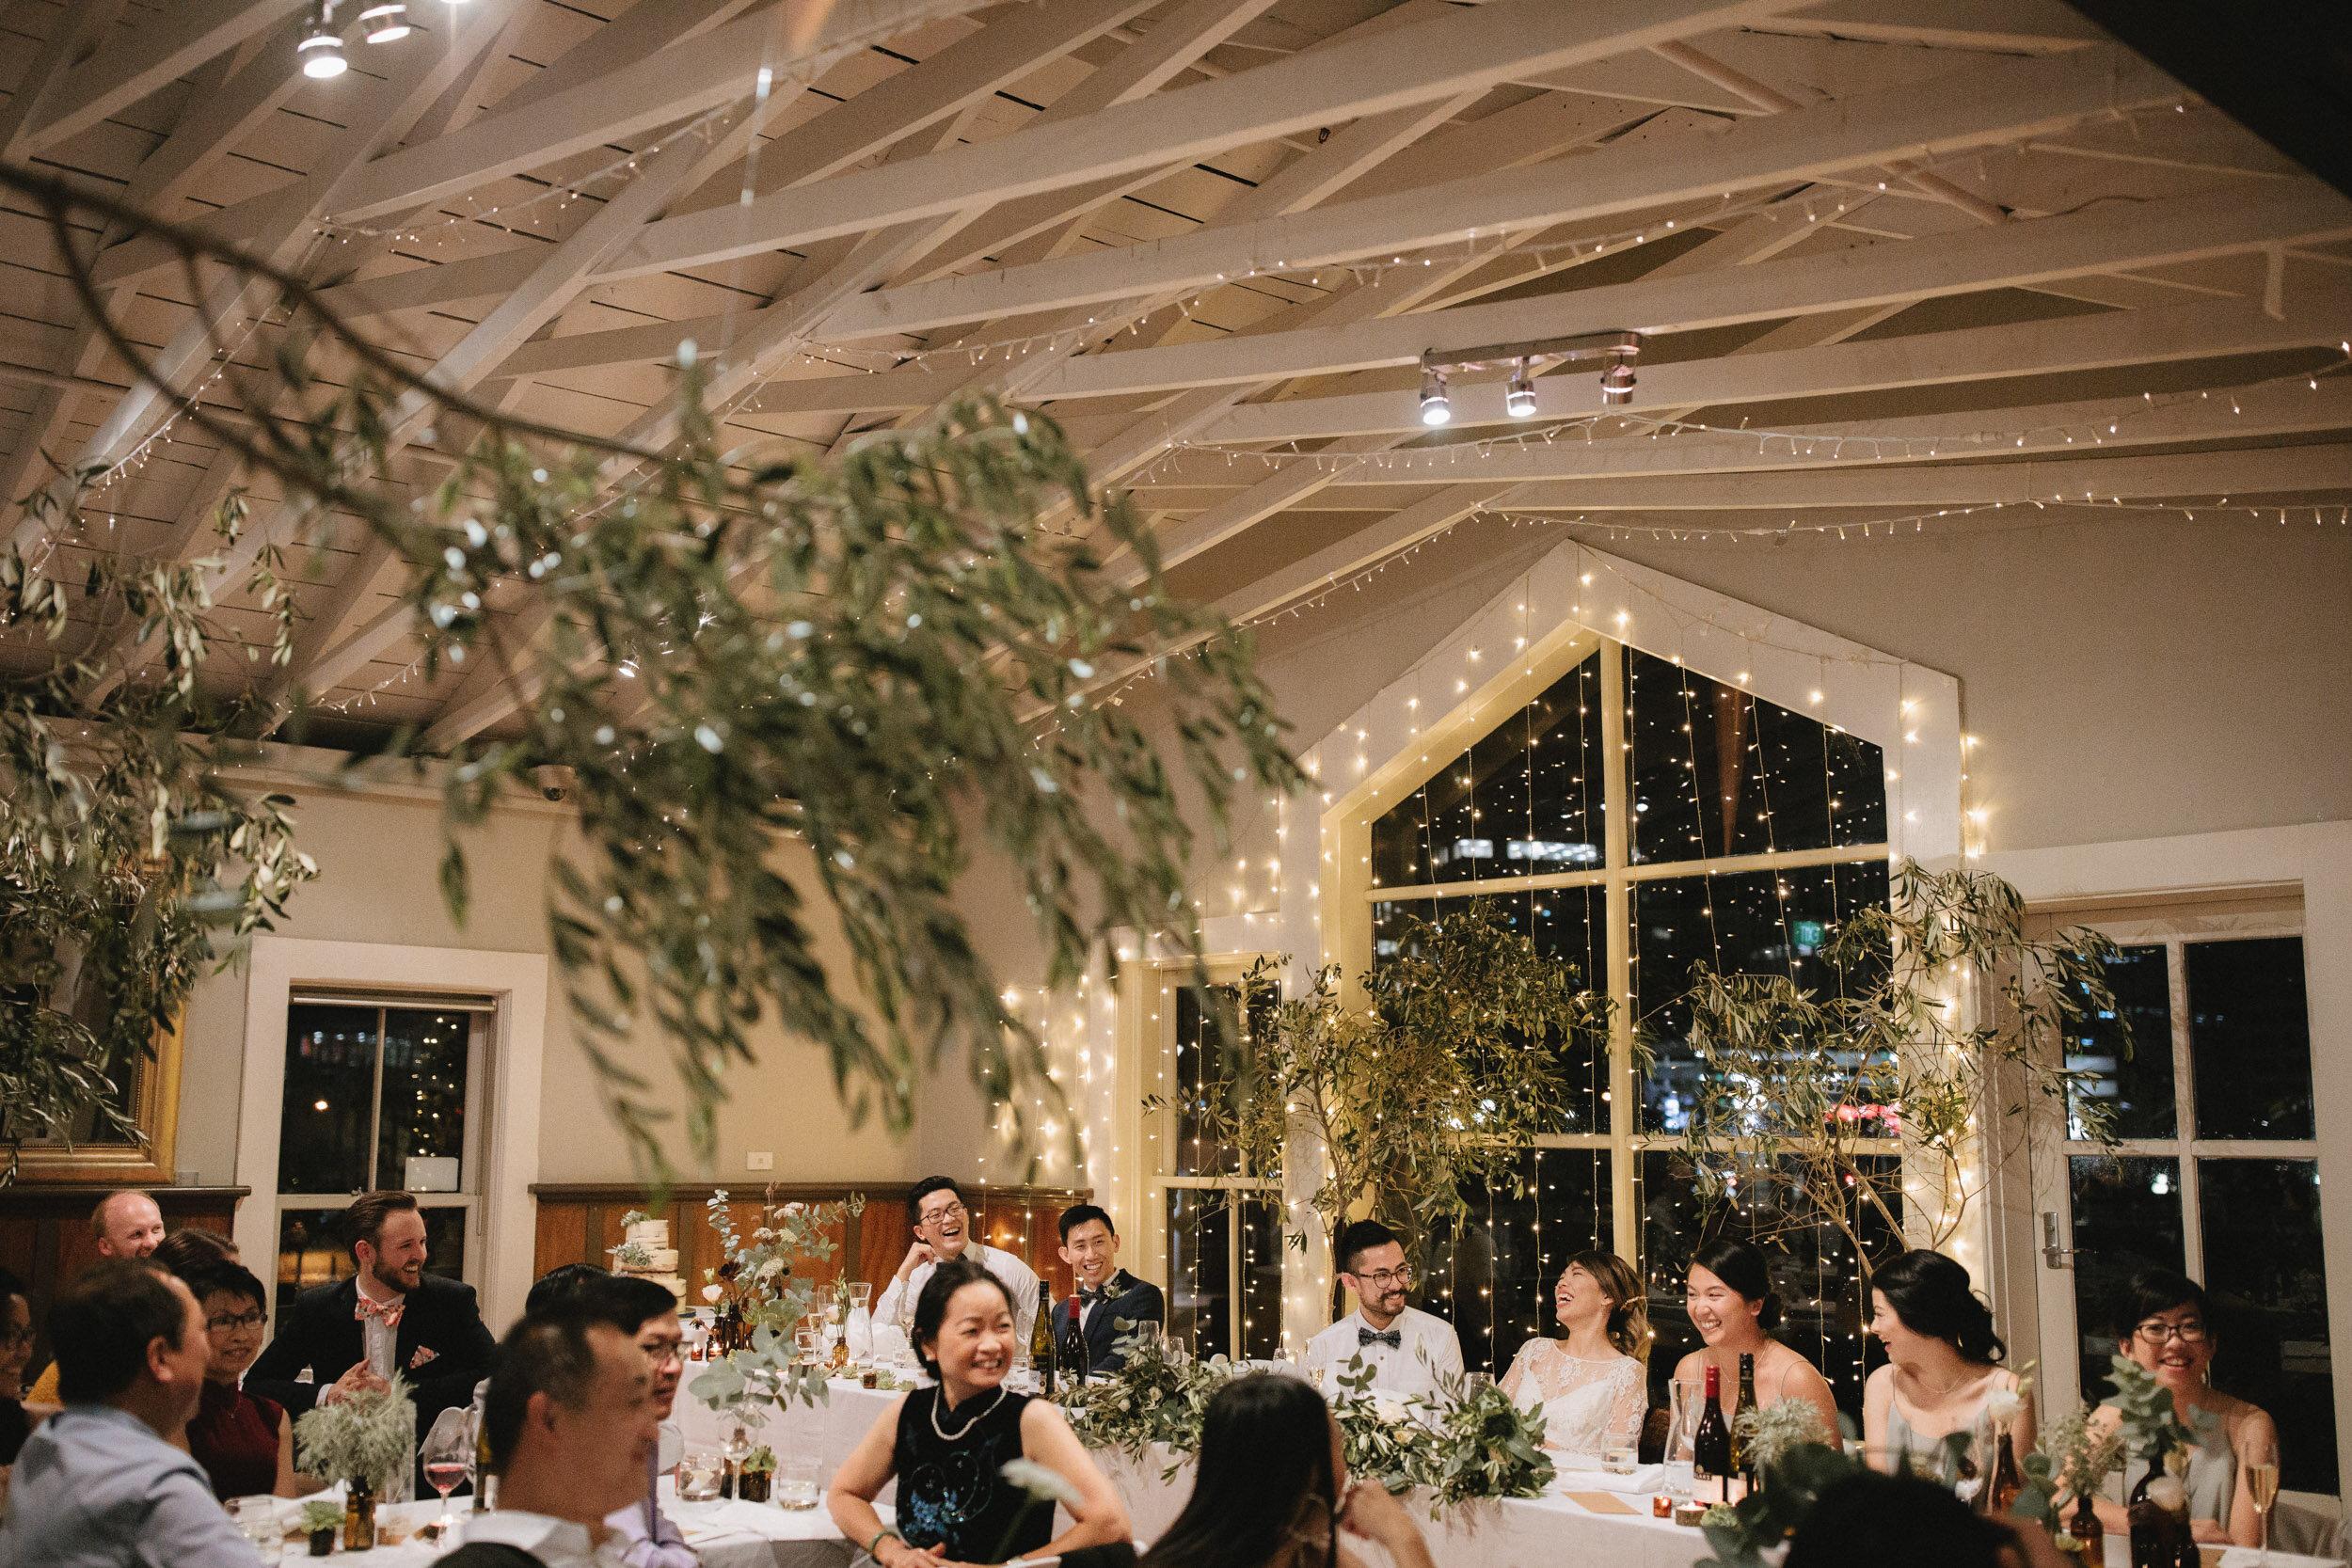 The Boatshed wedding reception venue Wellington Waterfront